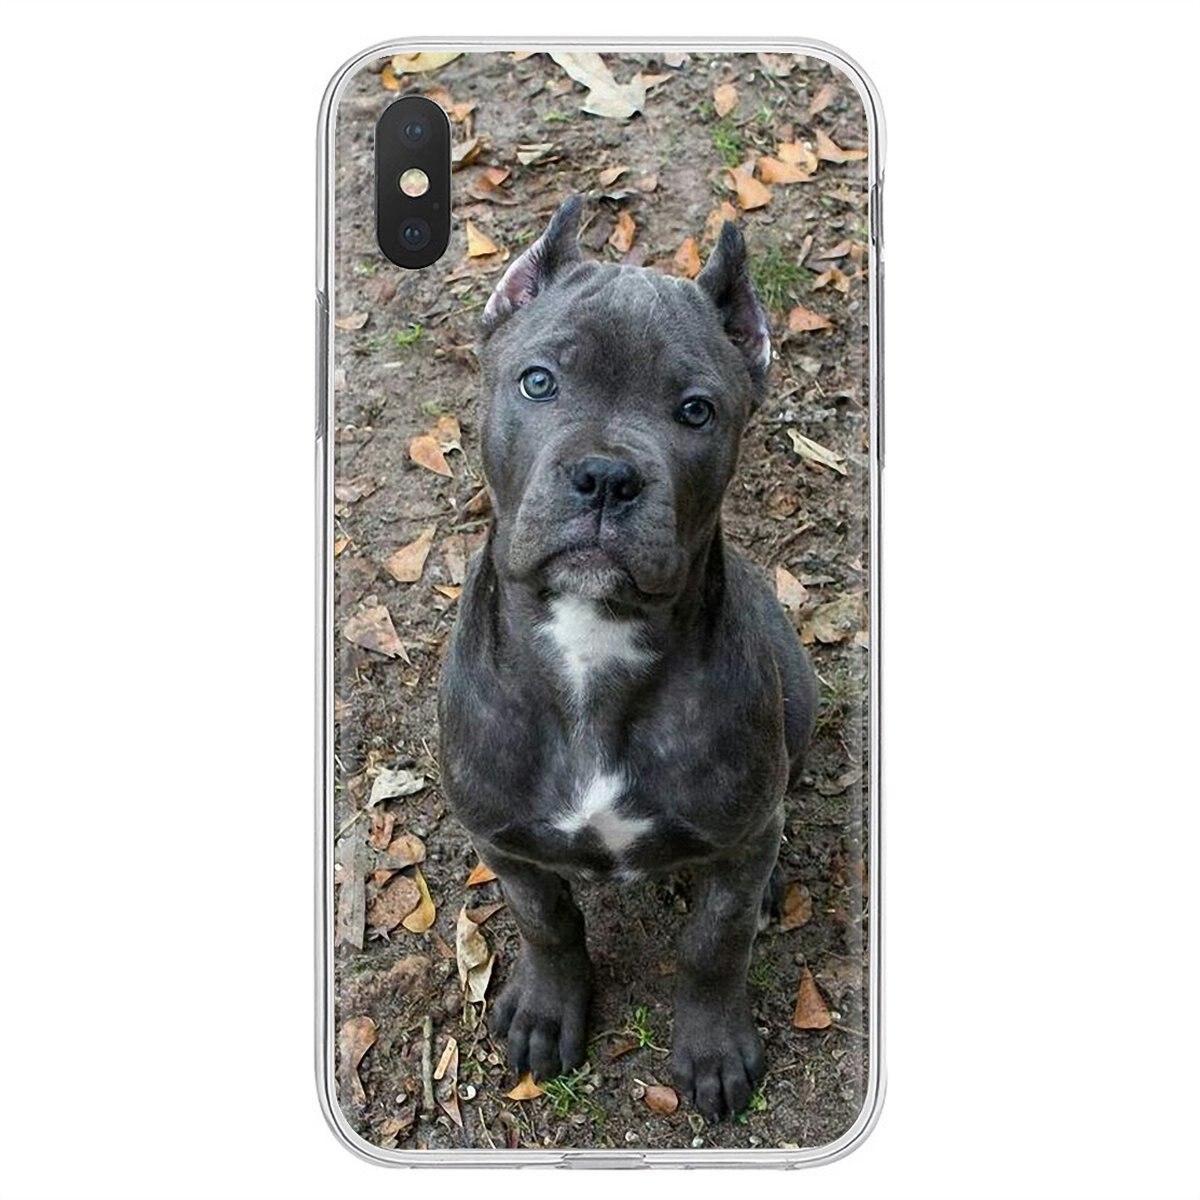 Funda suave para iPhone 11 Pro 4 4S 5 5S SE 5C 6 6S 7 8 X XR XS Plus Max para iPod Touch perros italianos caña Corso italiano mastiff